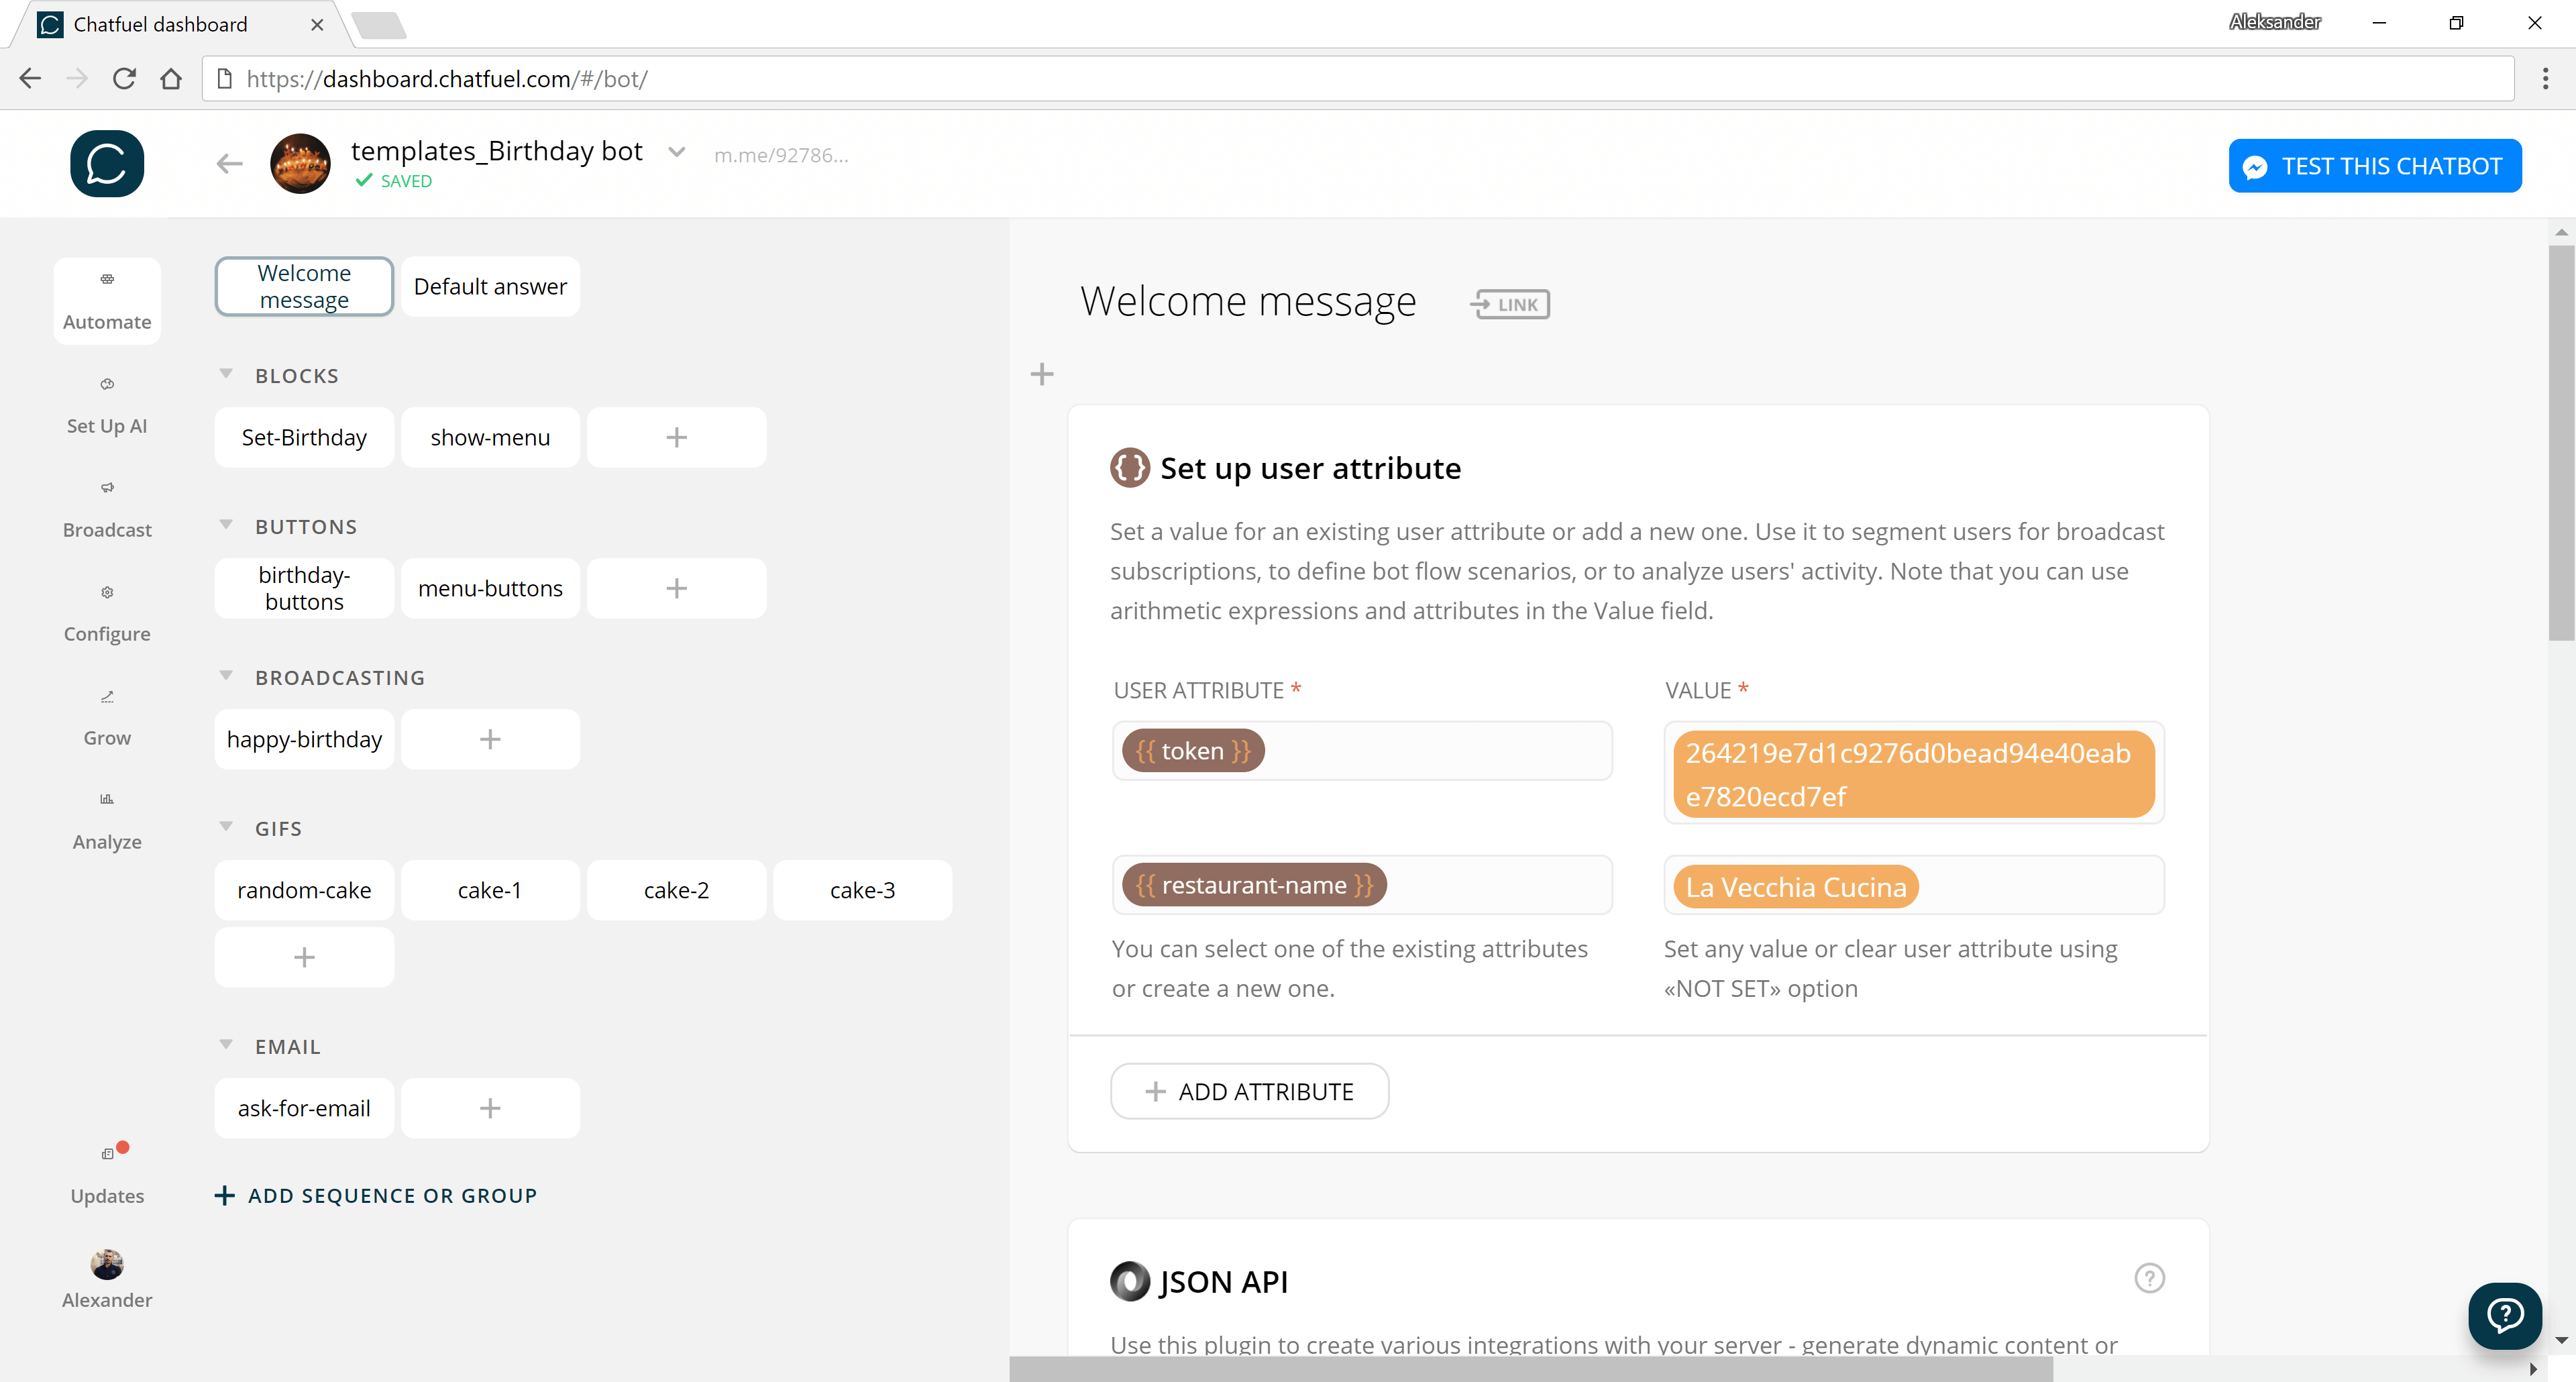 Chatfuel flow editor screenshot for Free Birthday Cake Chatbot for Restaurants